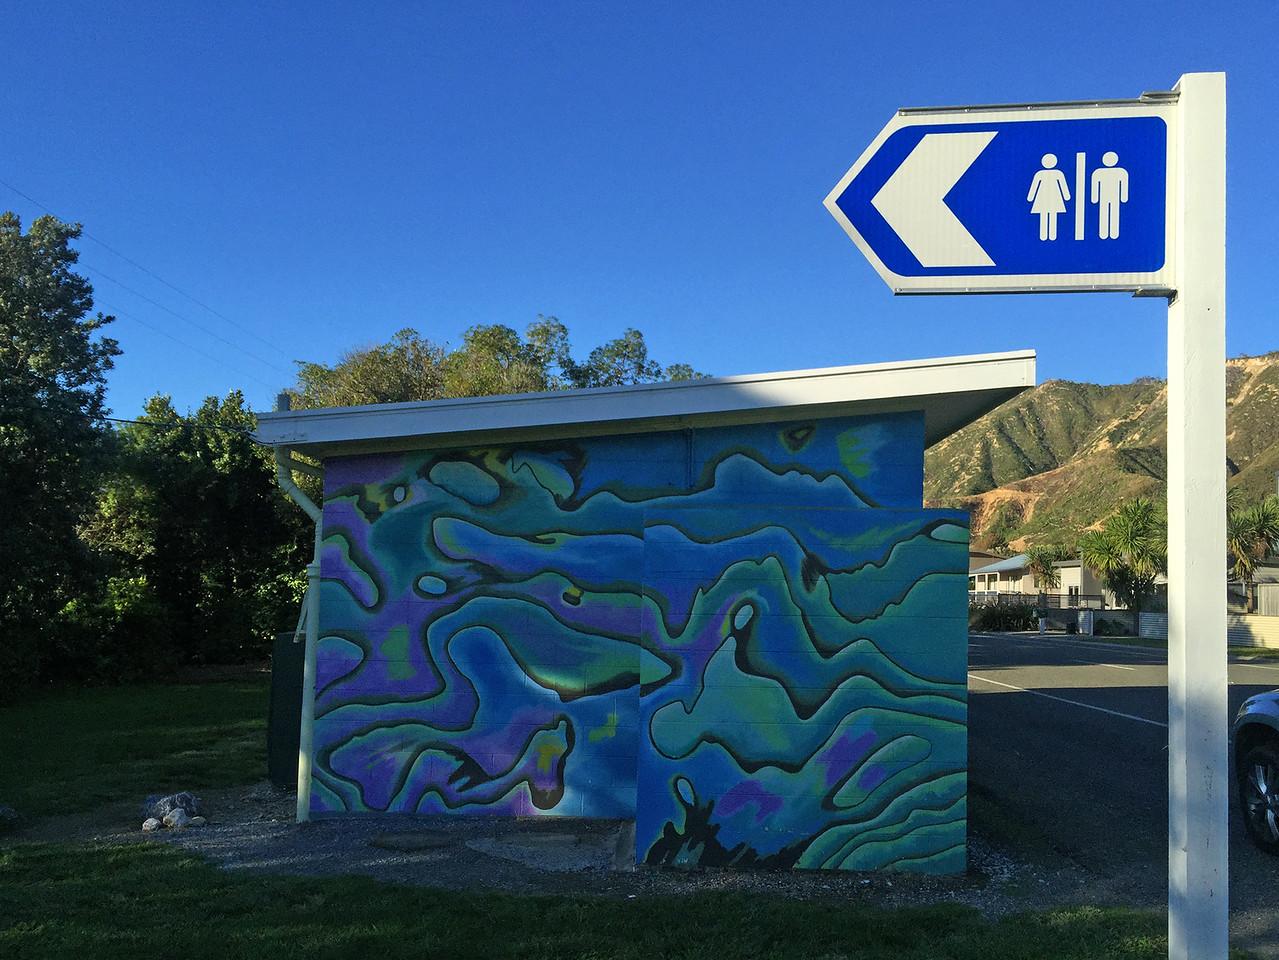 Public toilet at Tata Beach - Tarakohe, New Zealand